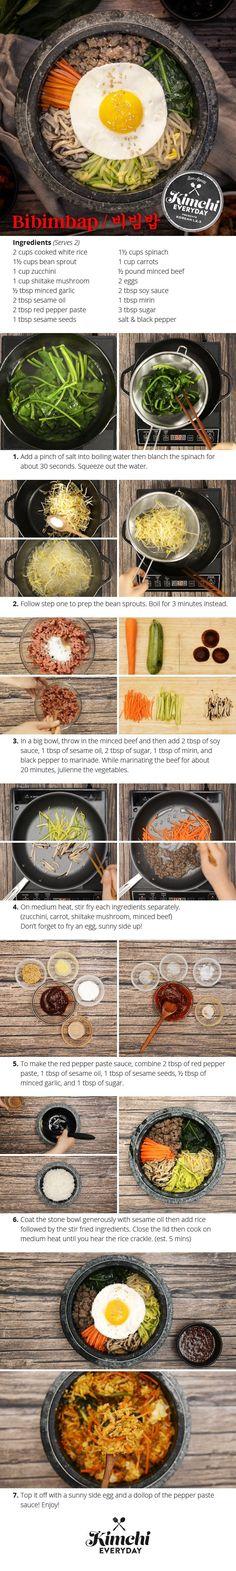 Kimchi Everyday season 2 is here! We're kicking off the new season with Korea's iconinc dish, bibimbap!: